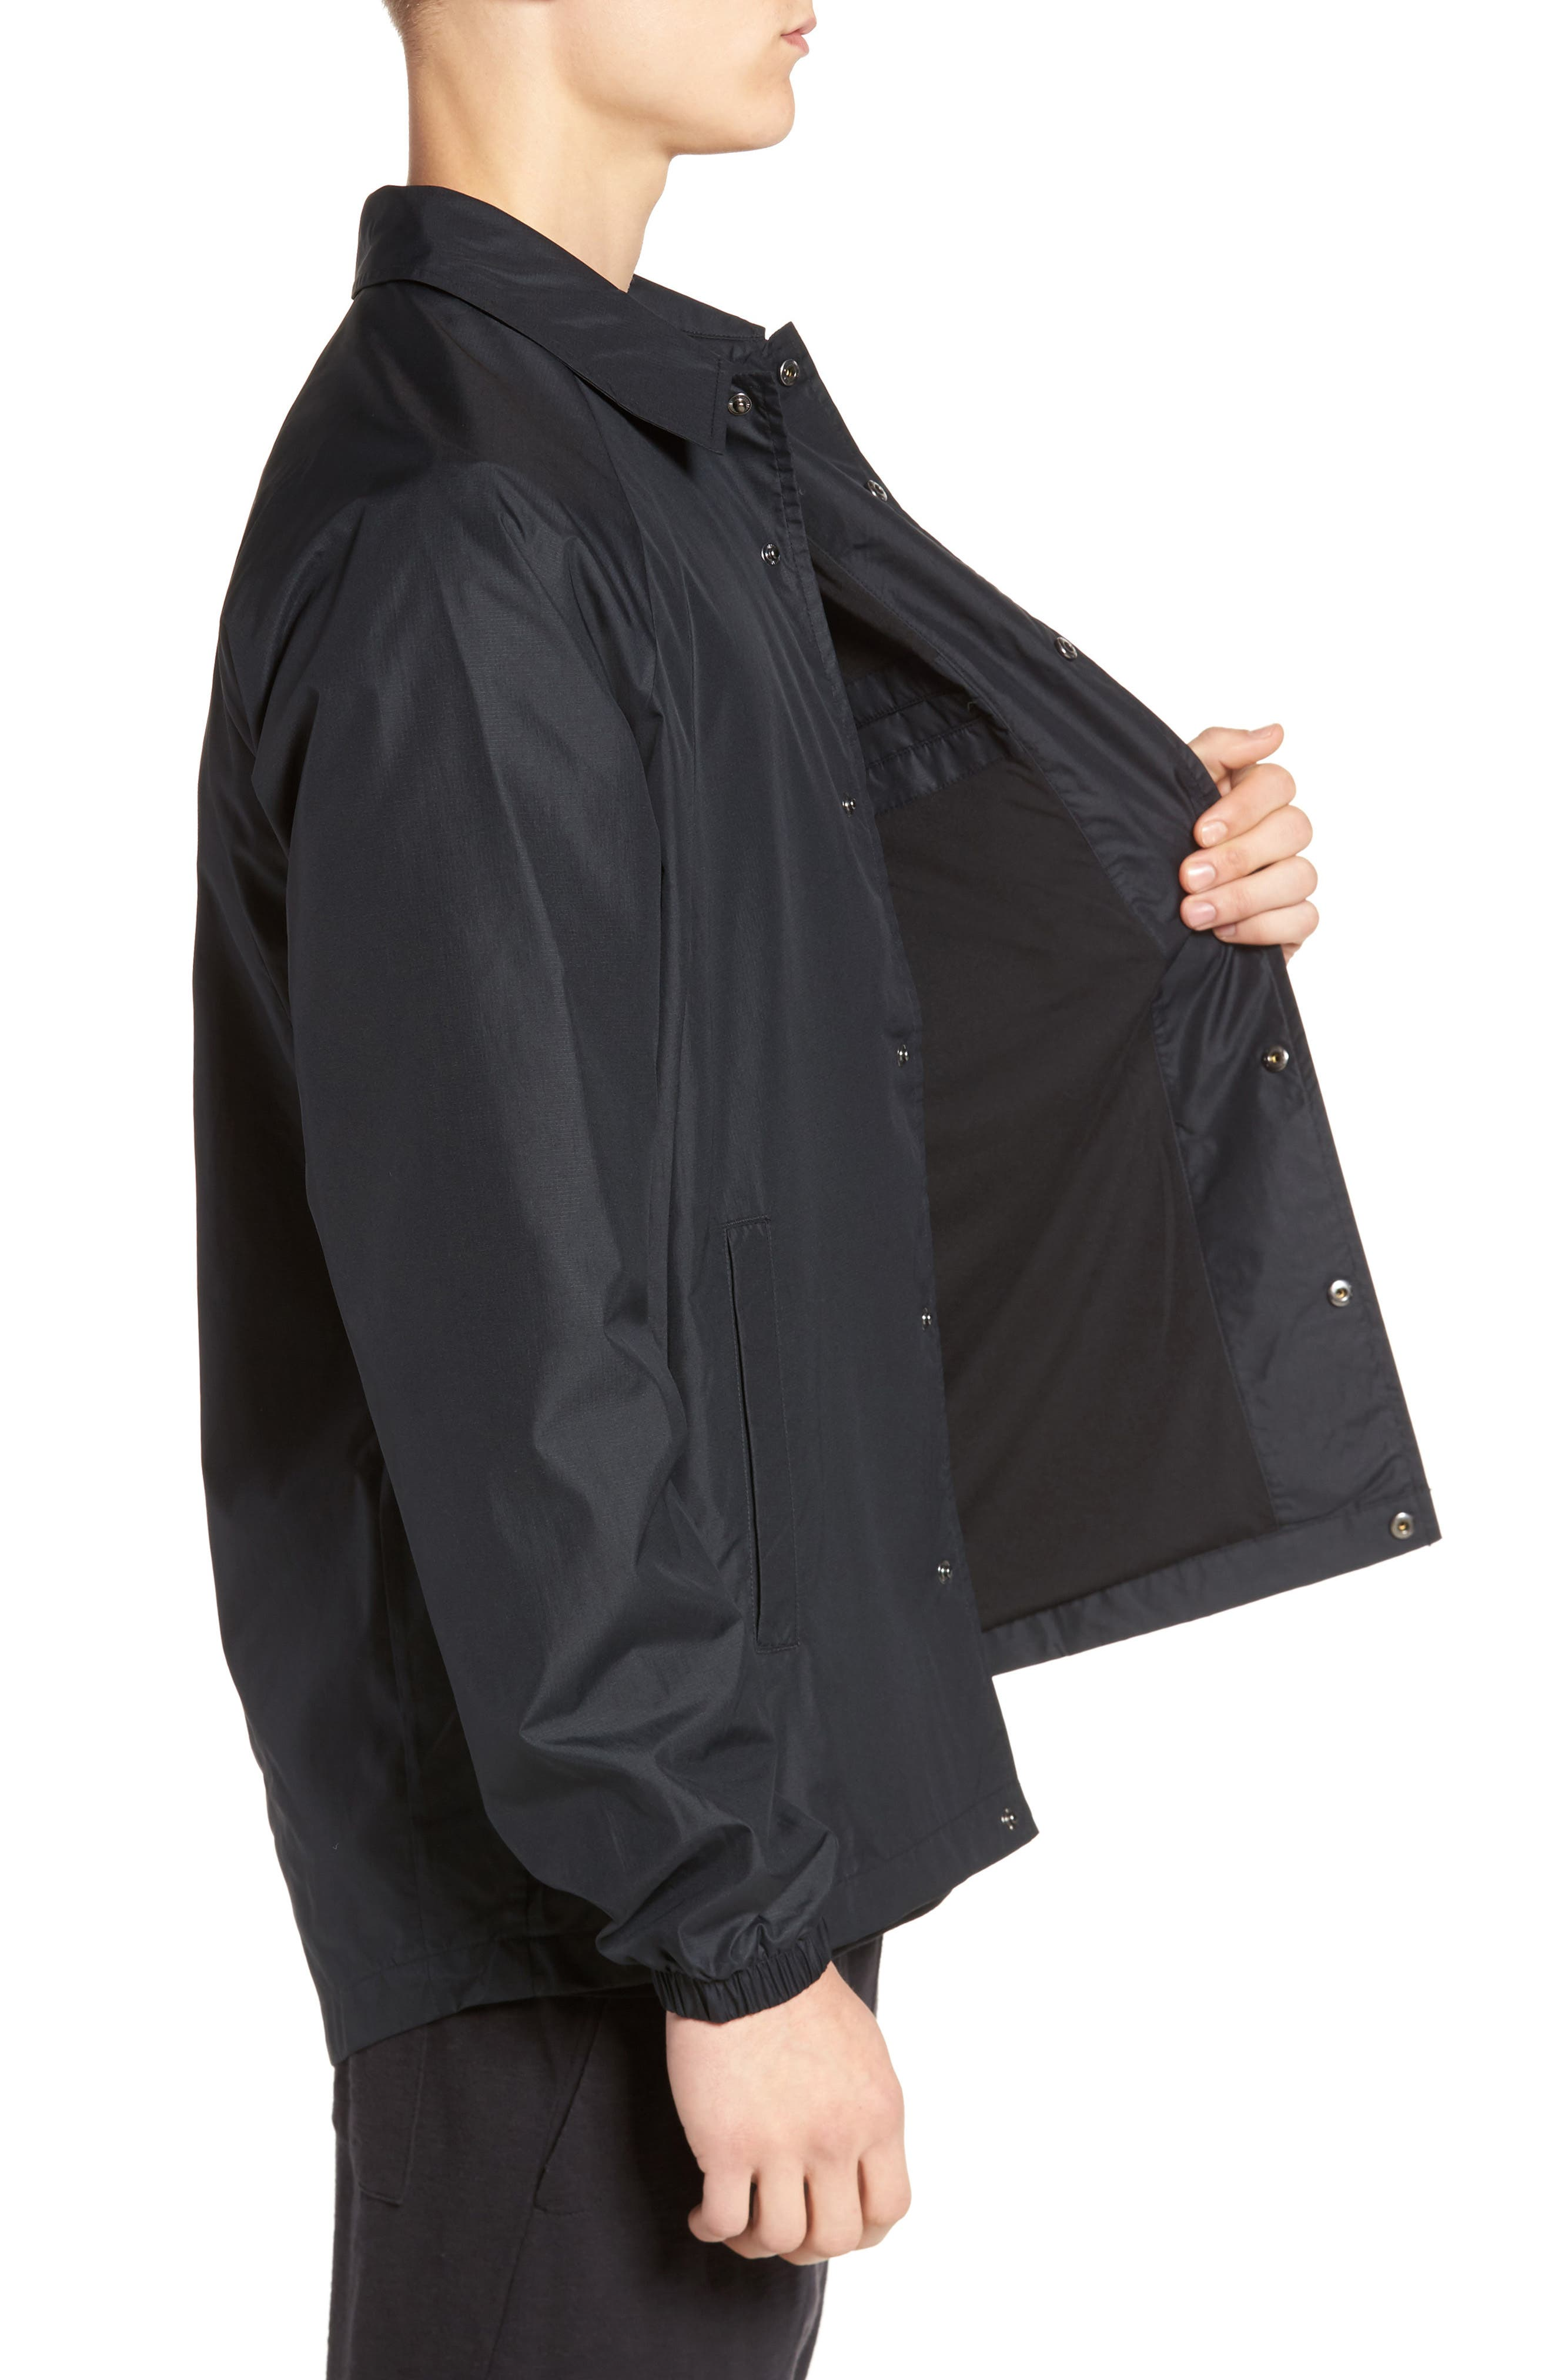 Nike Wings Coach's Jacket,                             Alternate thumbnail 3, color,                             010